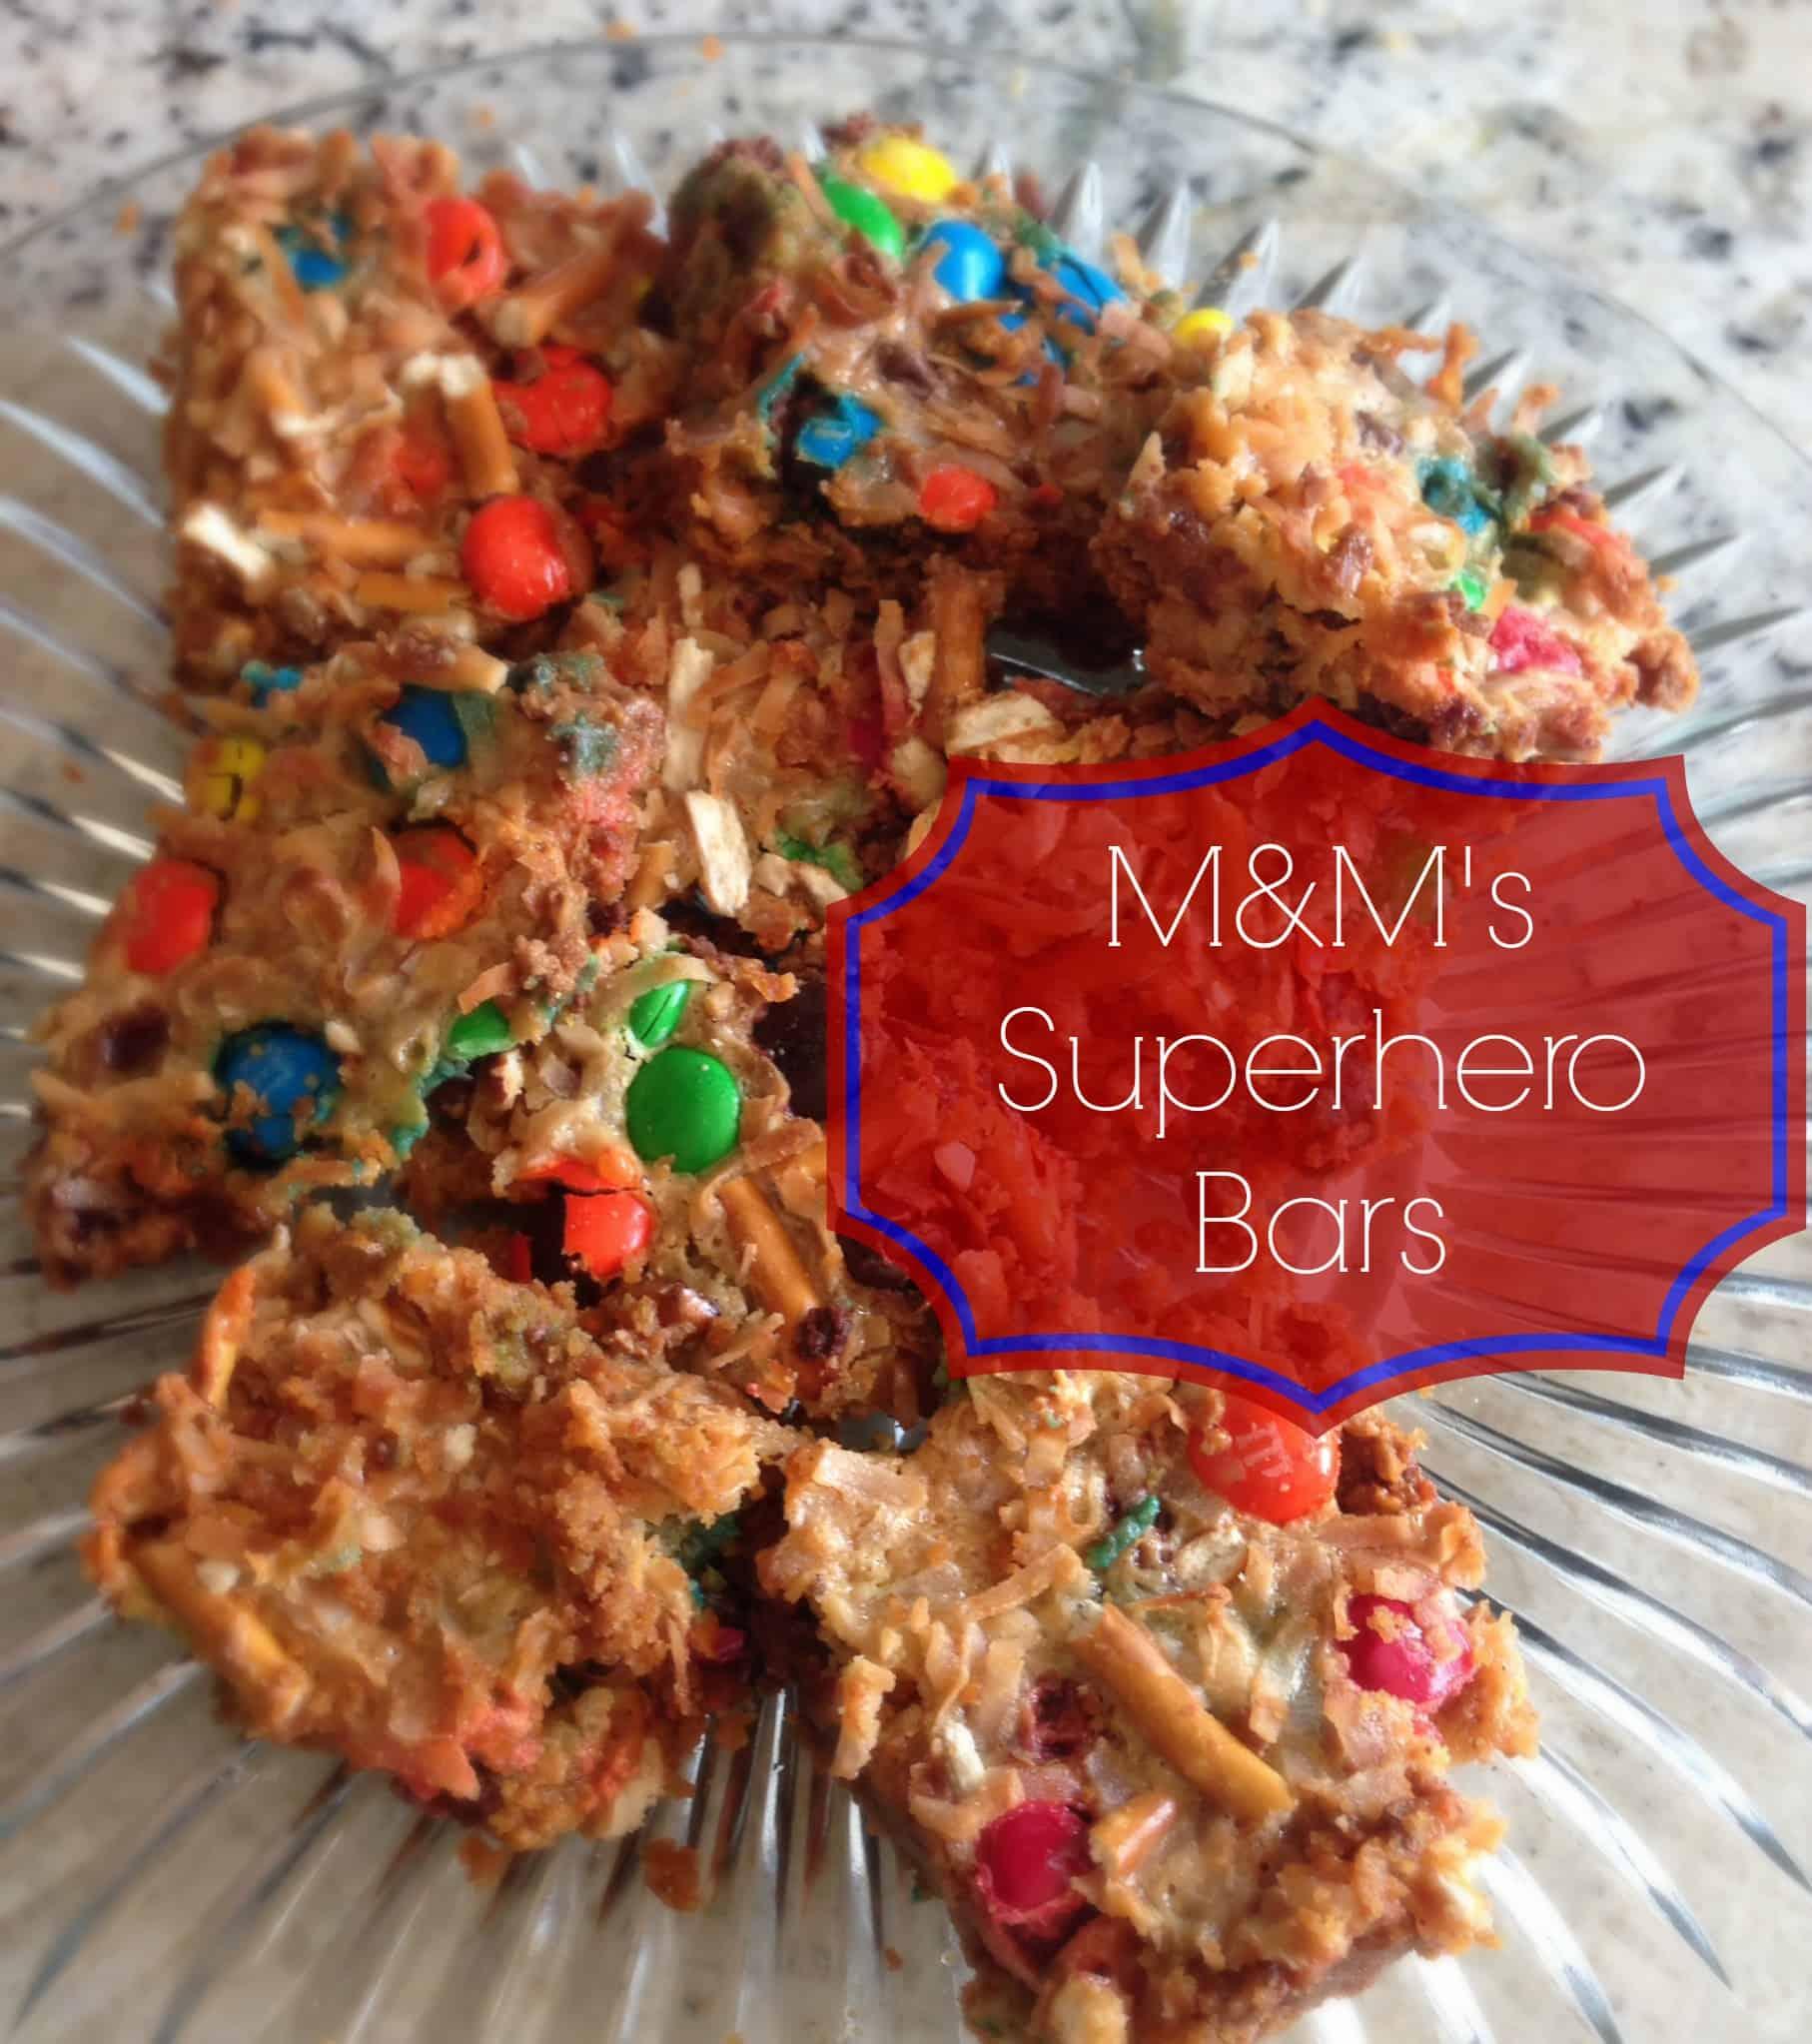 M&M's Superhero Bars